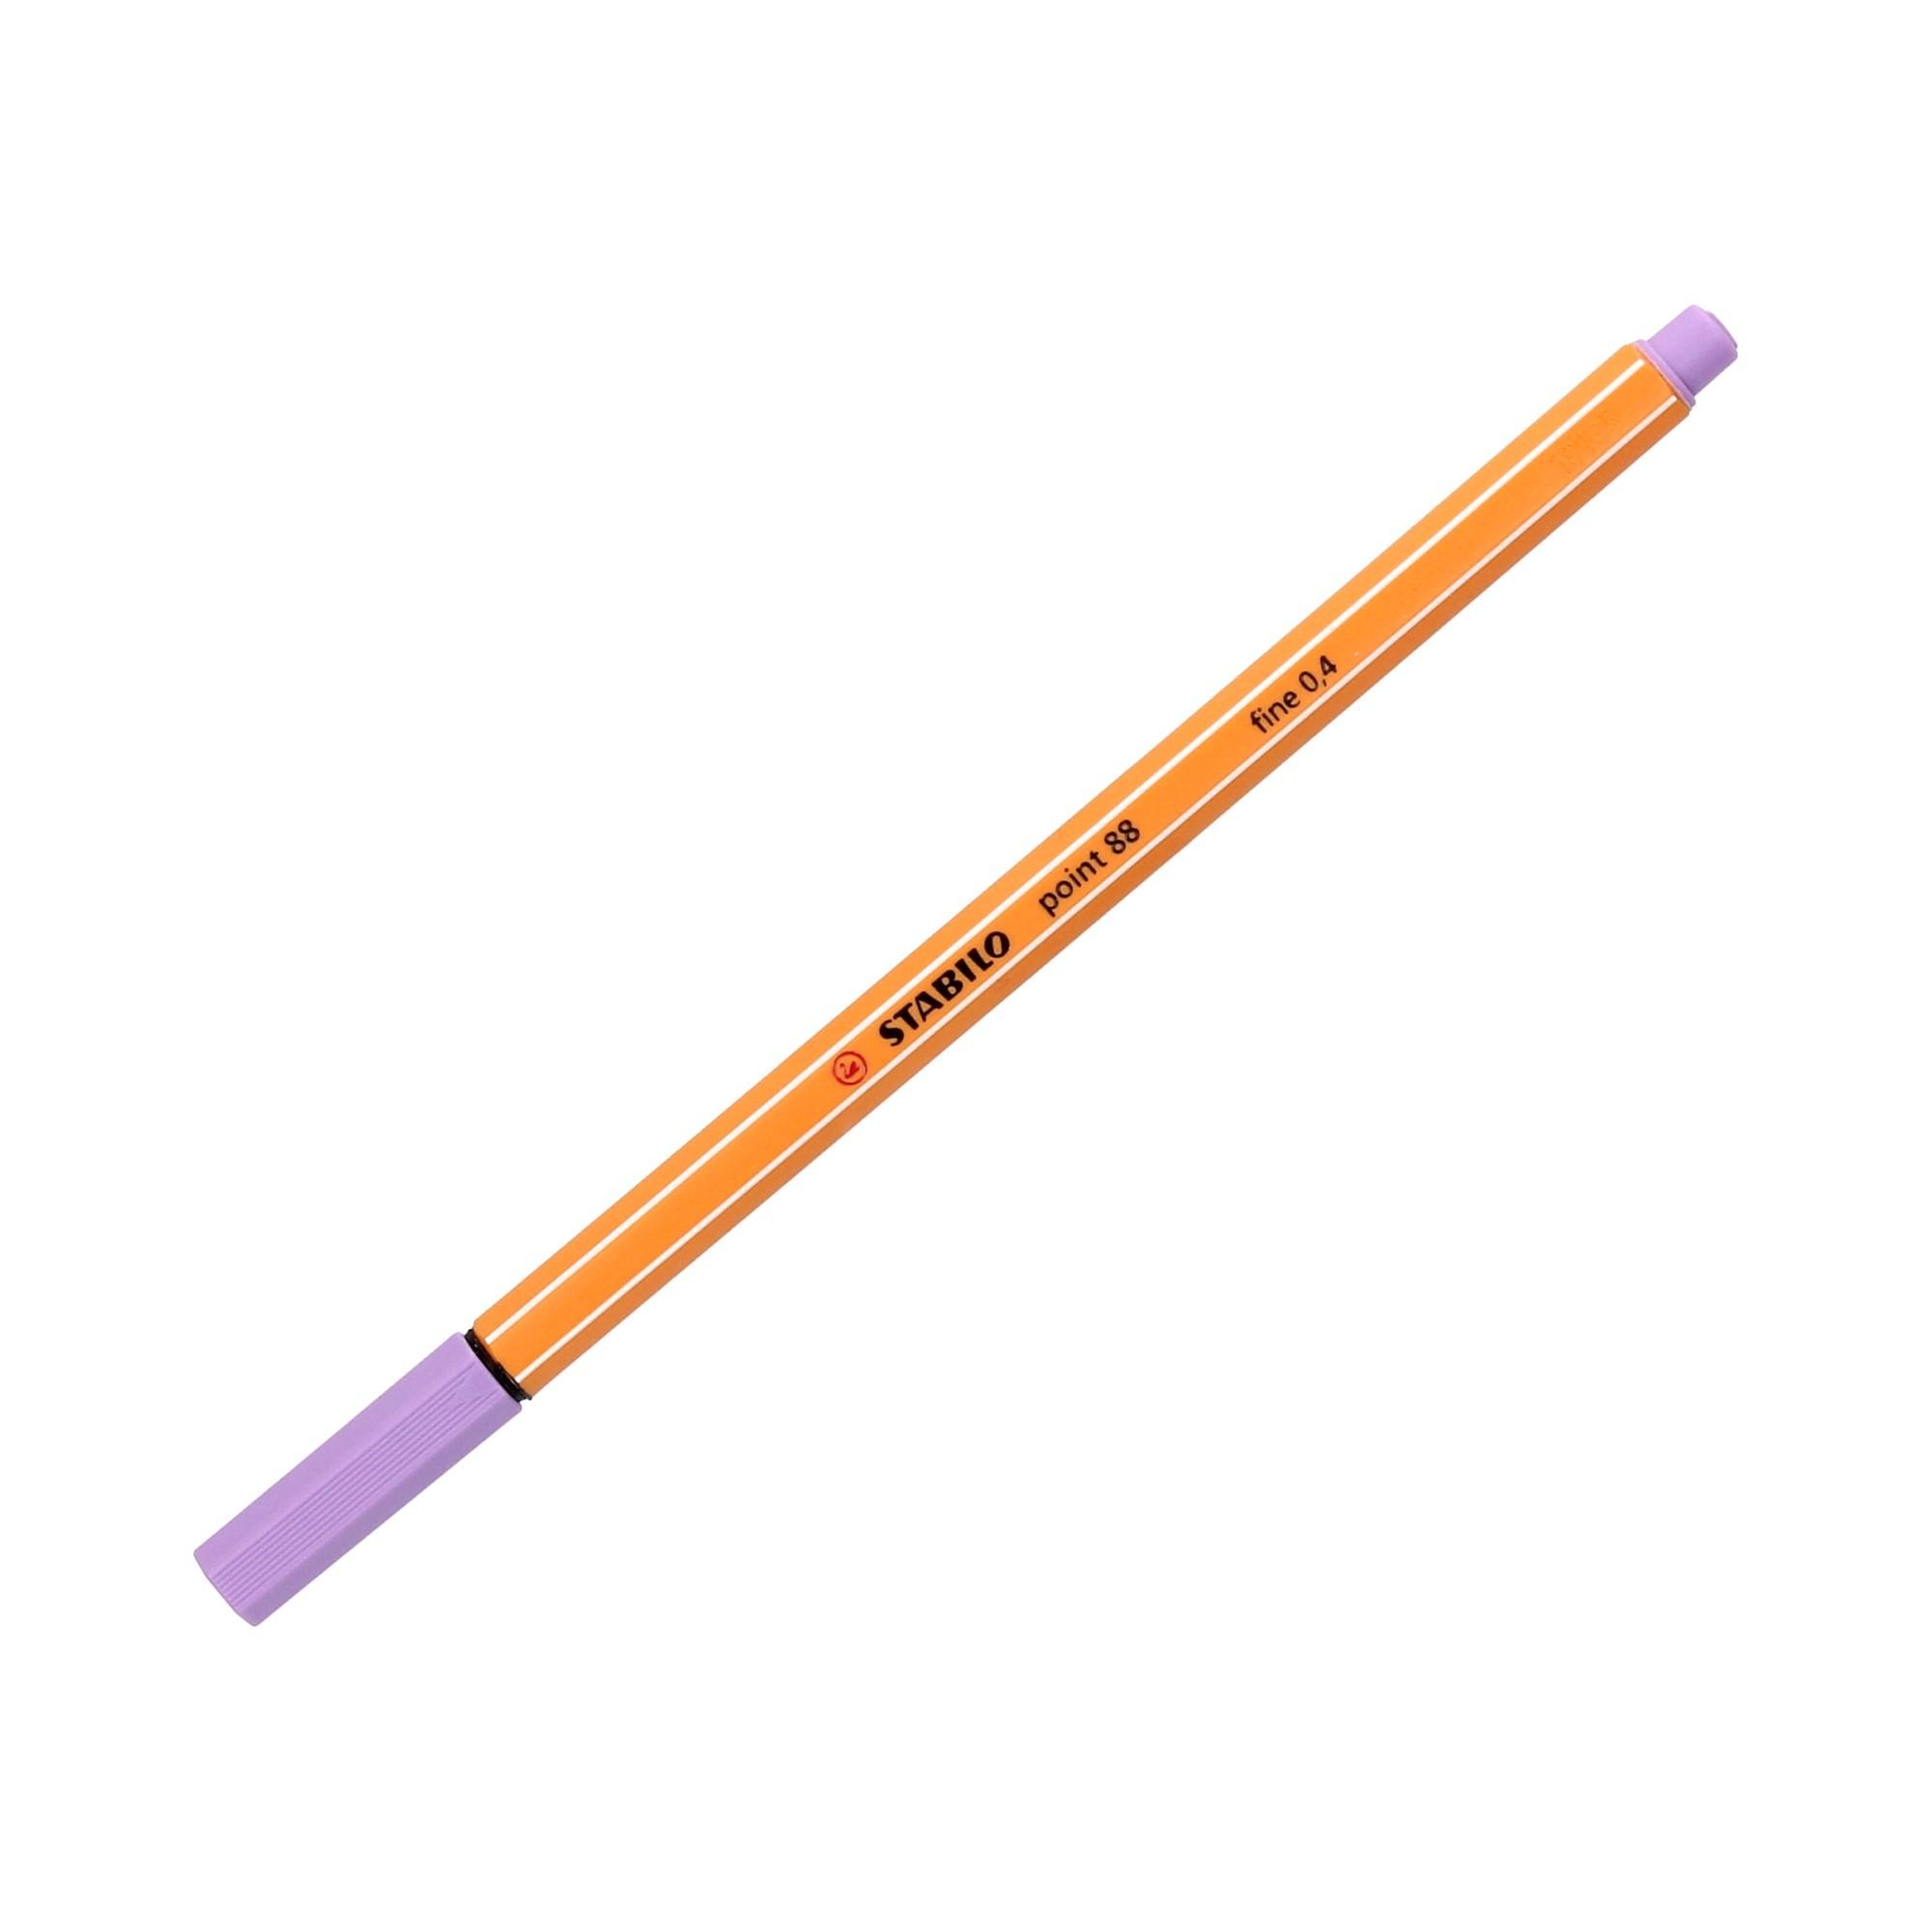 Cienkopis 0.4mm jasnoliliowy Point 88/59